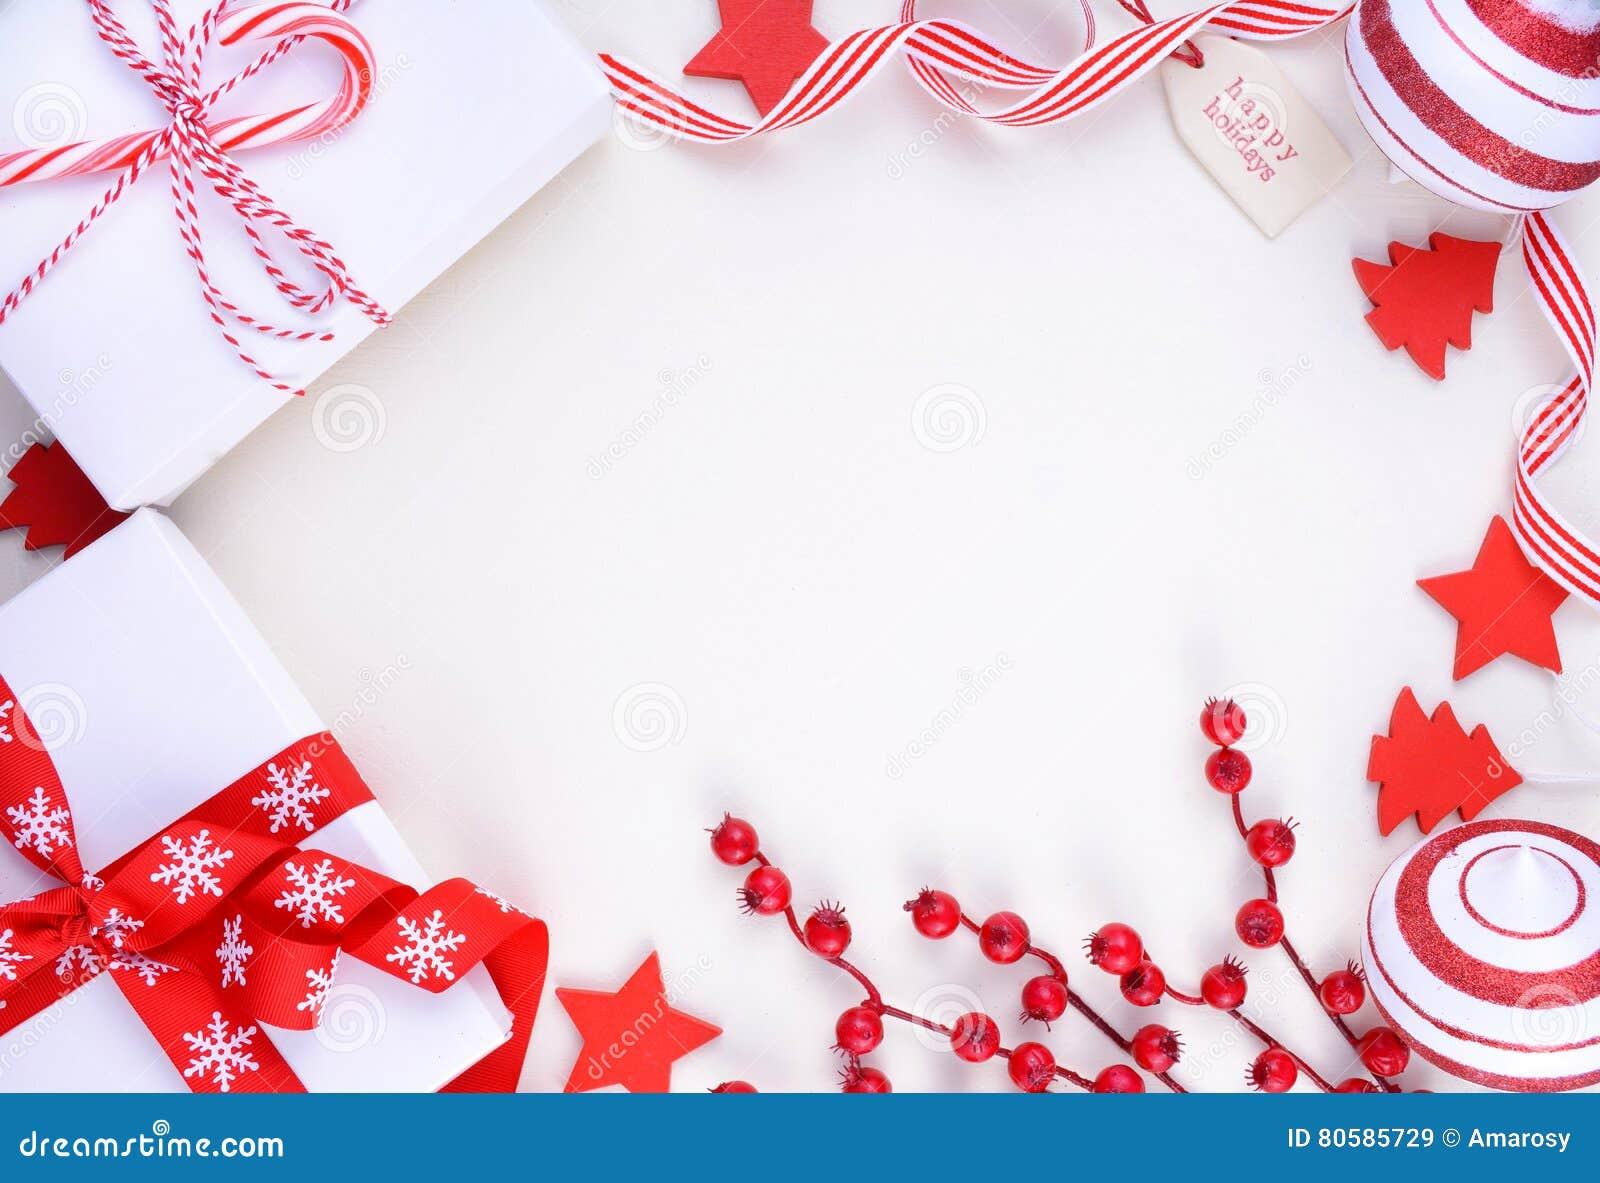 Festive Holiday Christmas Tree Borders Royalty Free